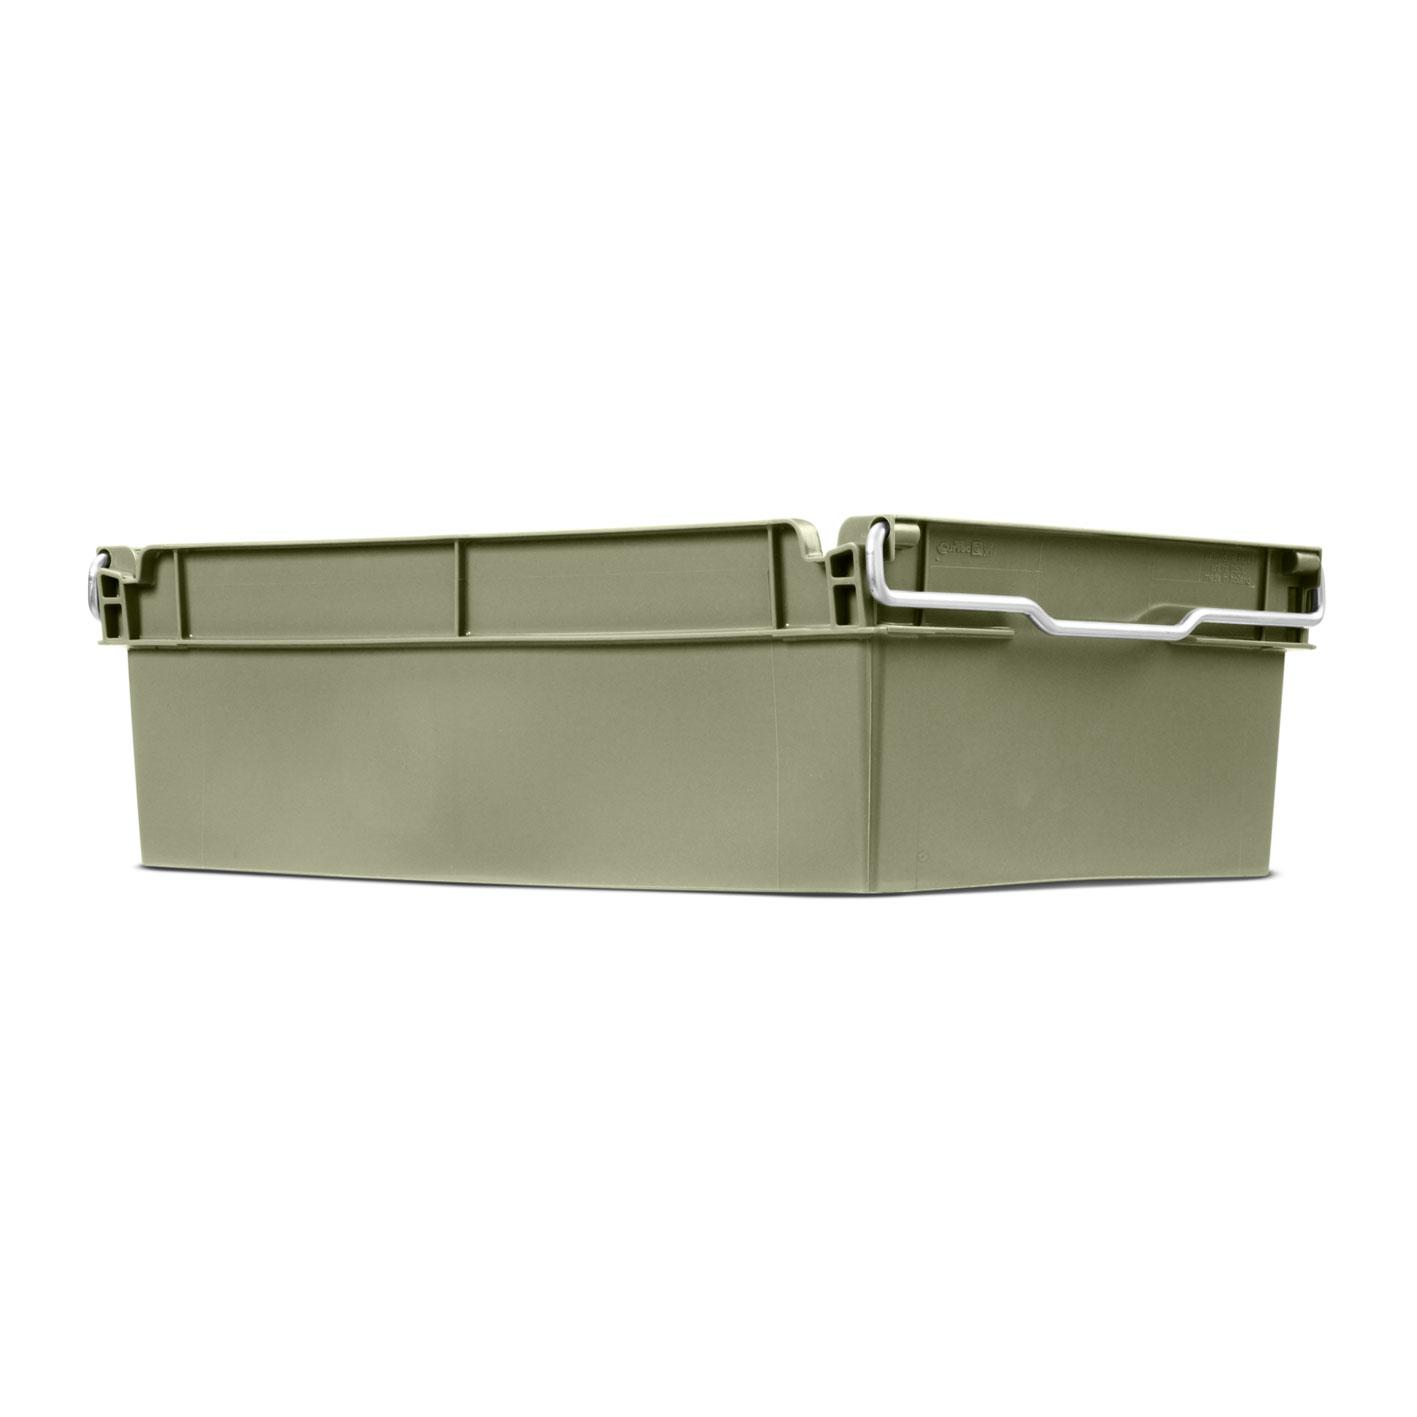 12 litre swingbar crate